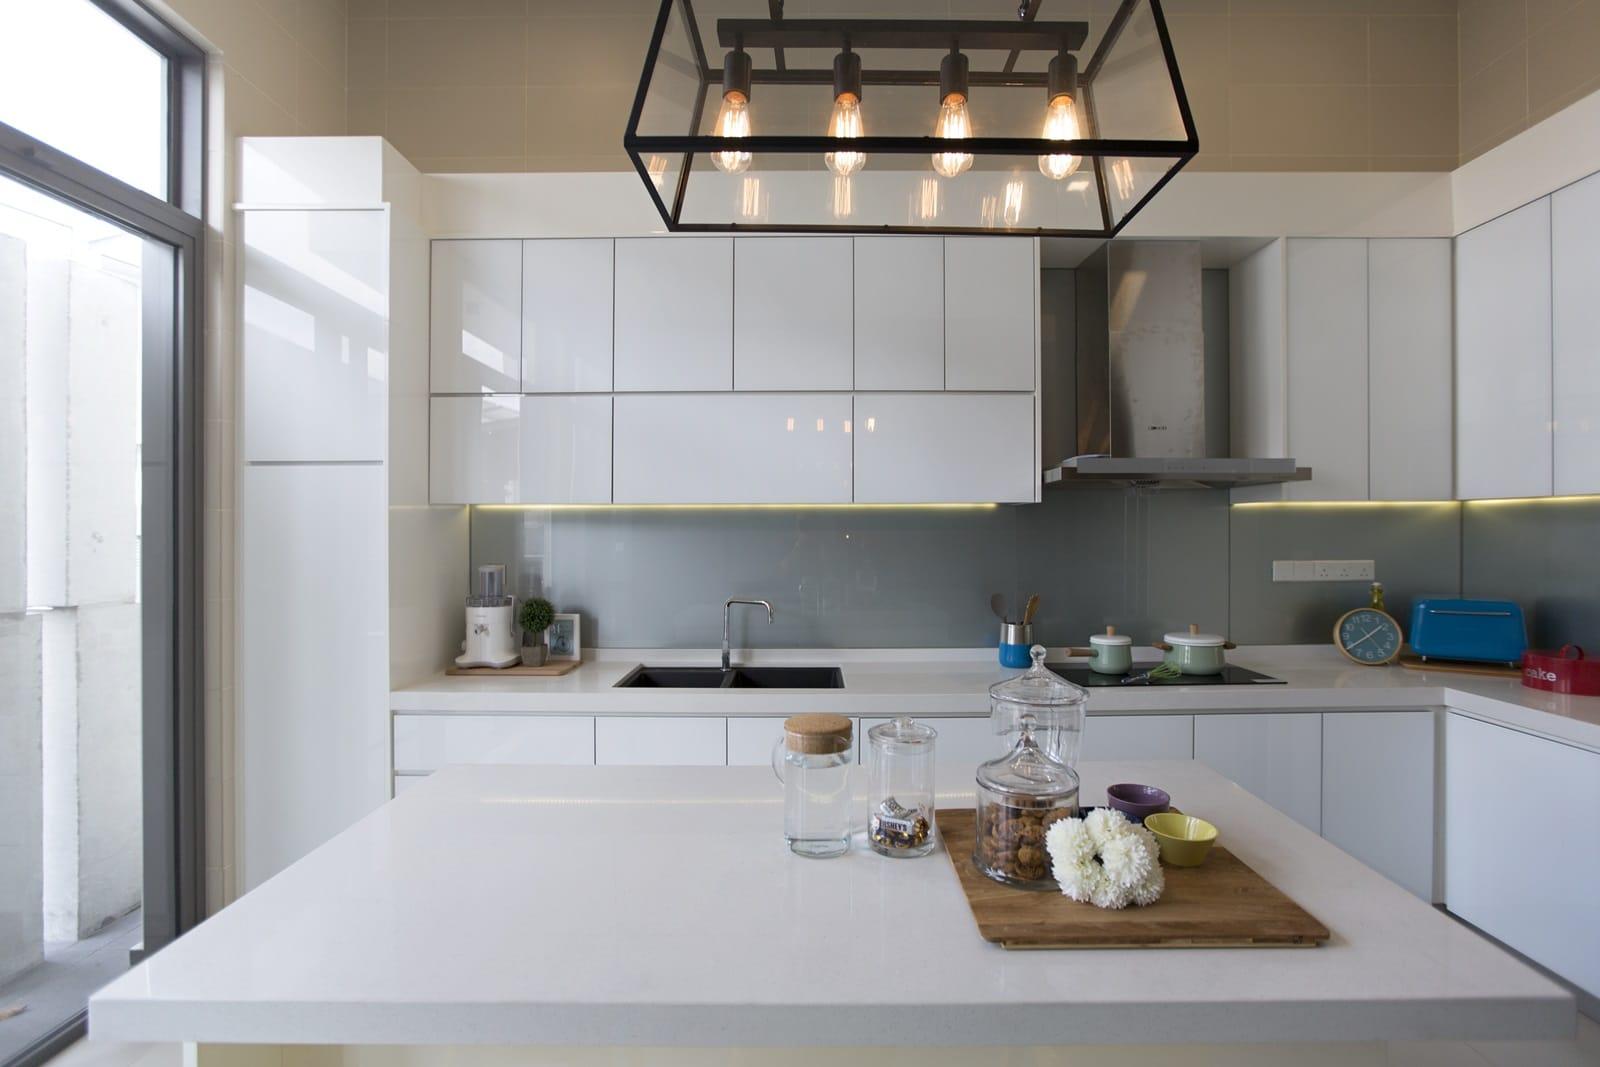 Modern Scandinavian Home In Desa Parkcity Designed To